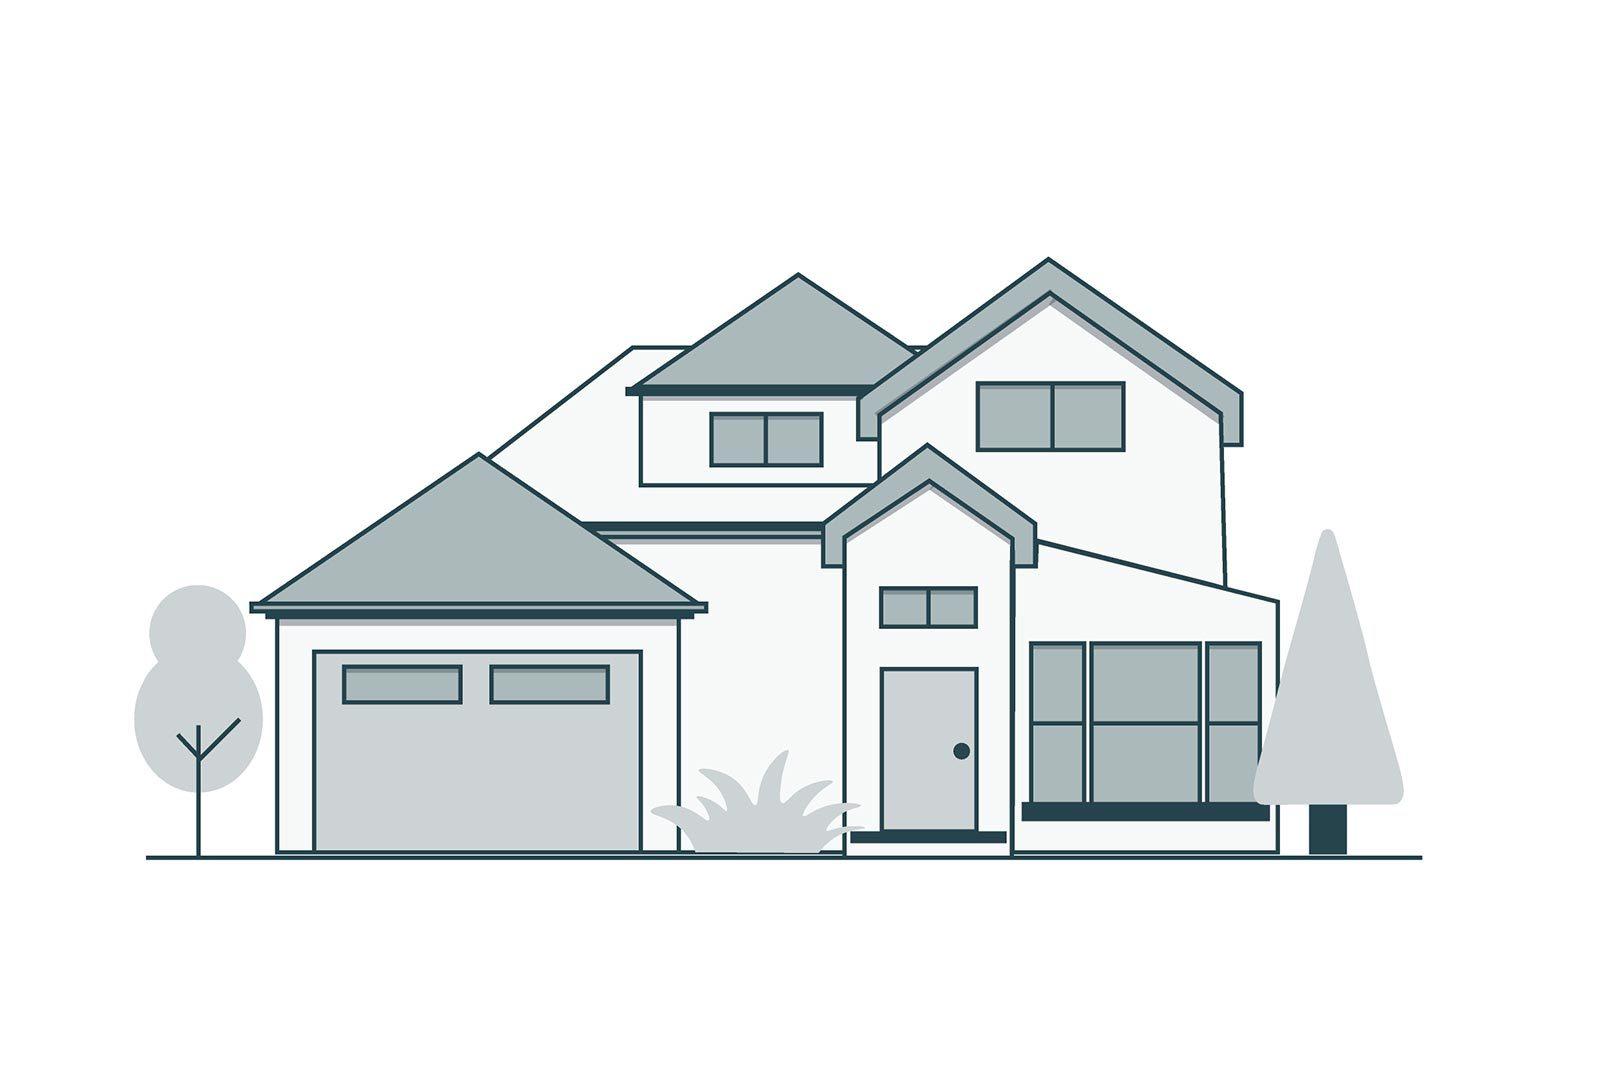 2031 1/2 Powell St San Francisco, CA 94133